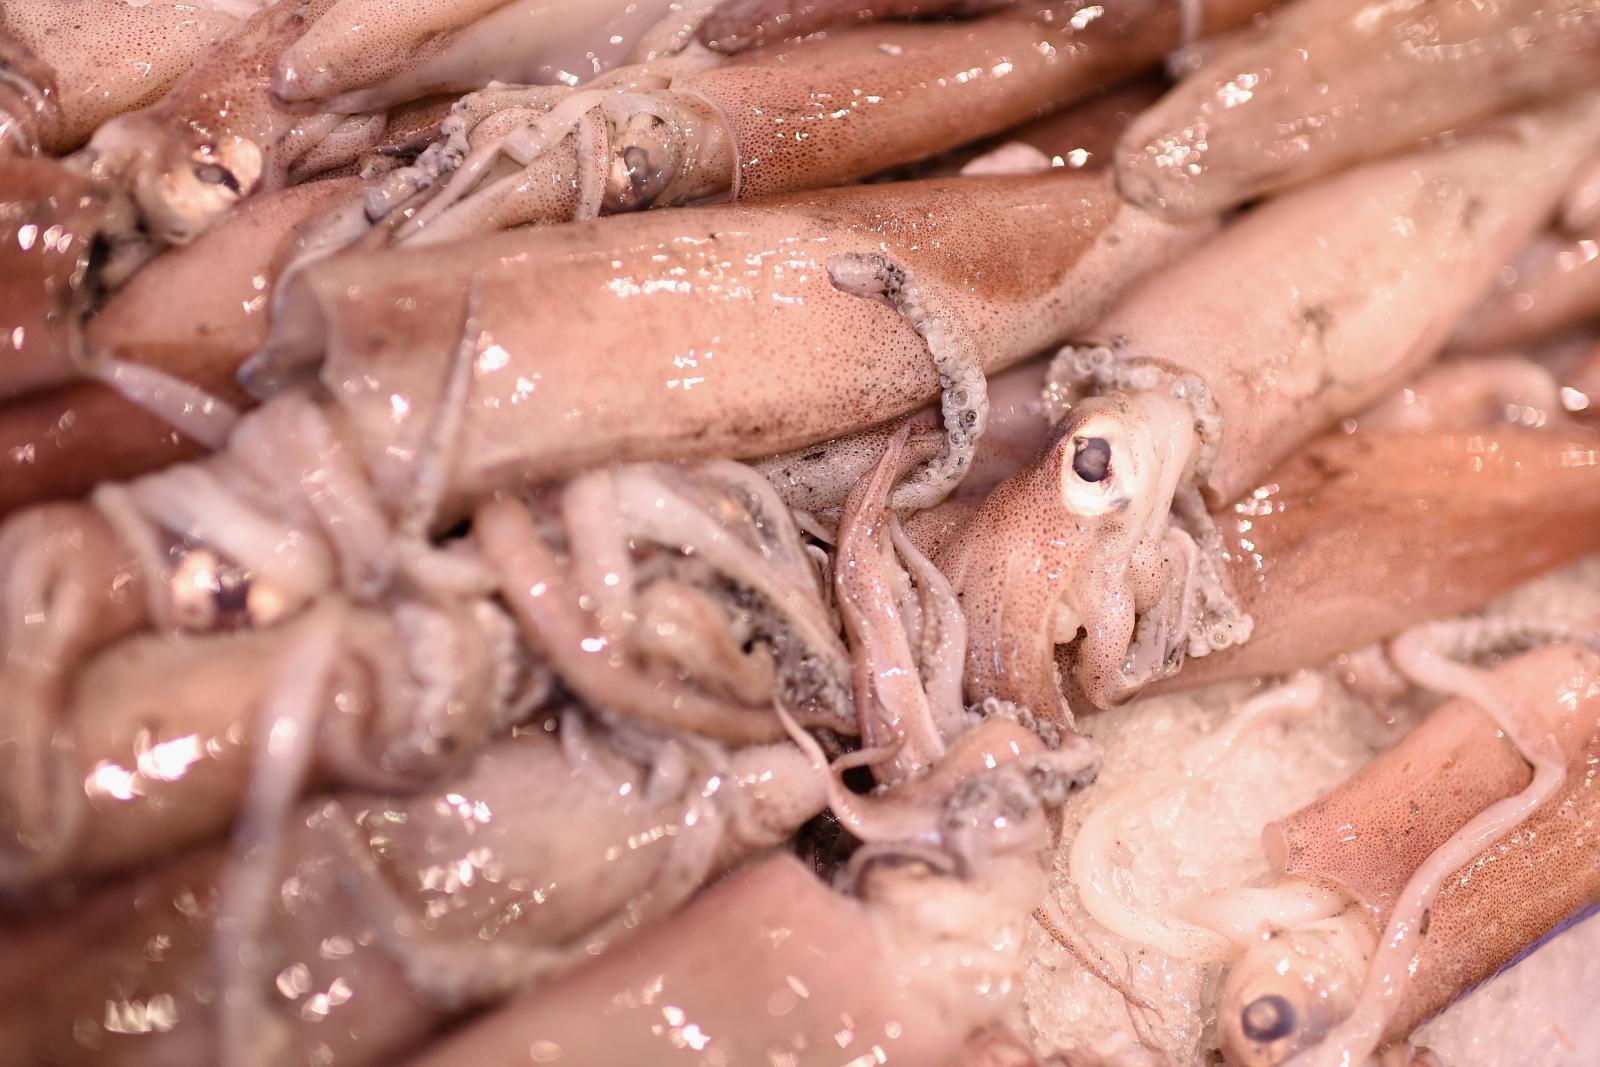 Squid at a fish market